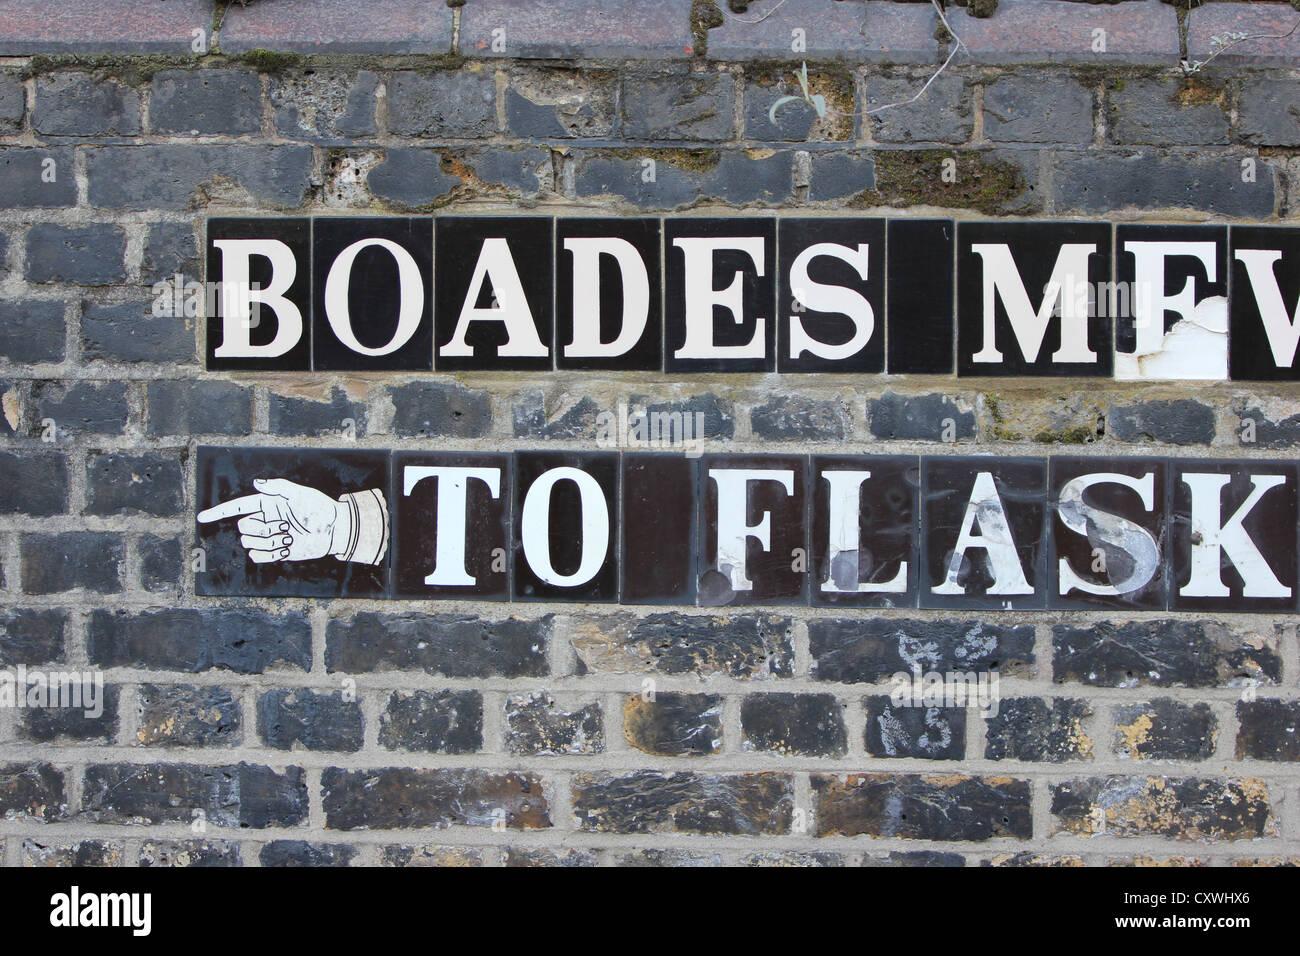 decorative tiles, writing, wall, street signs, London, U.K., city, europe, photoarkive - Stock Image